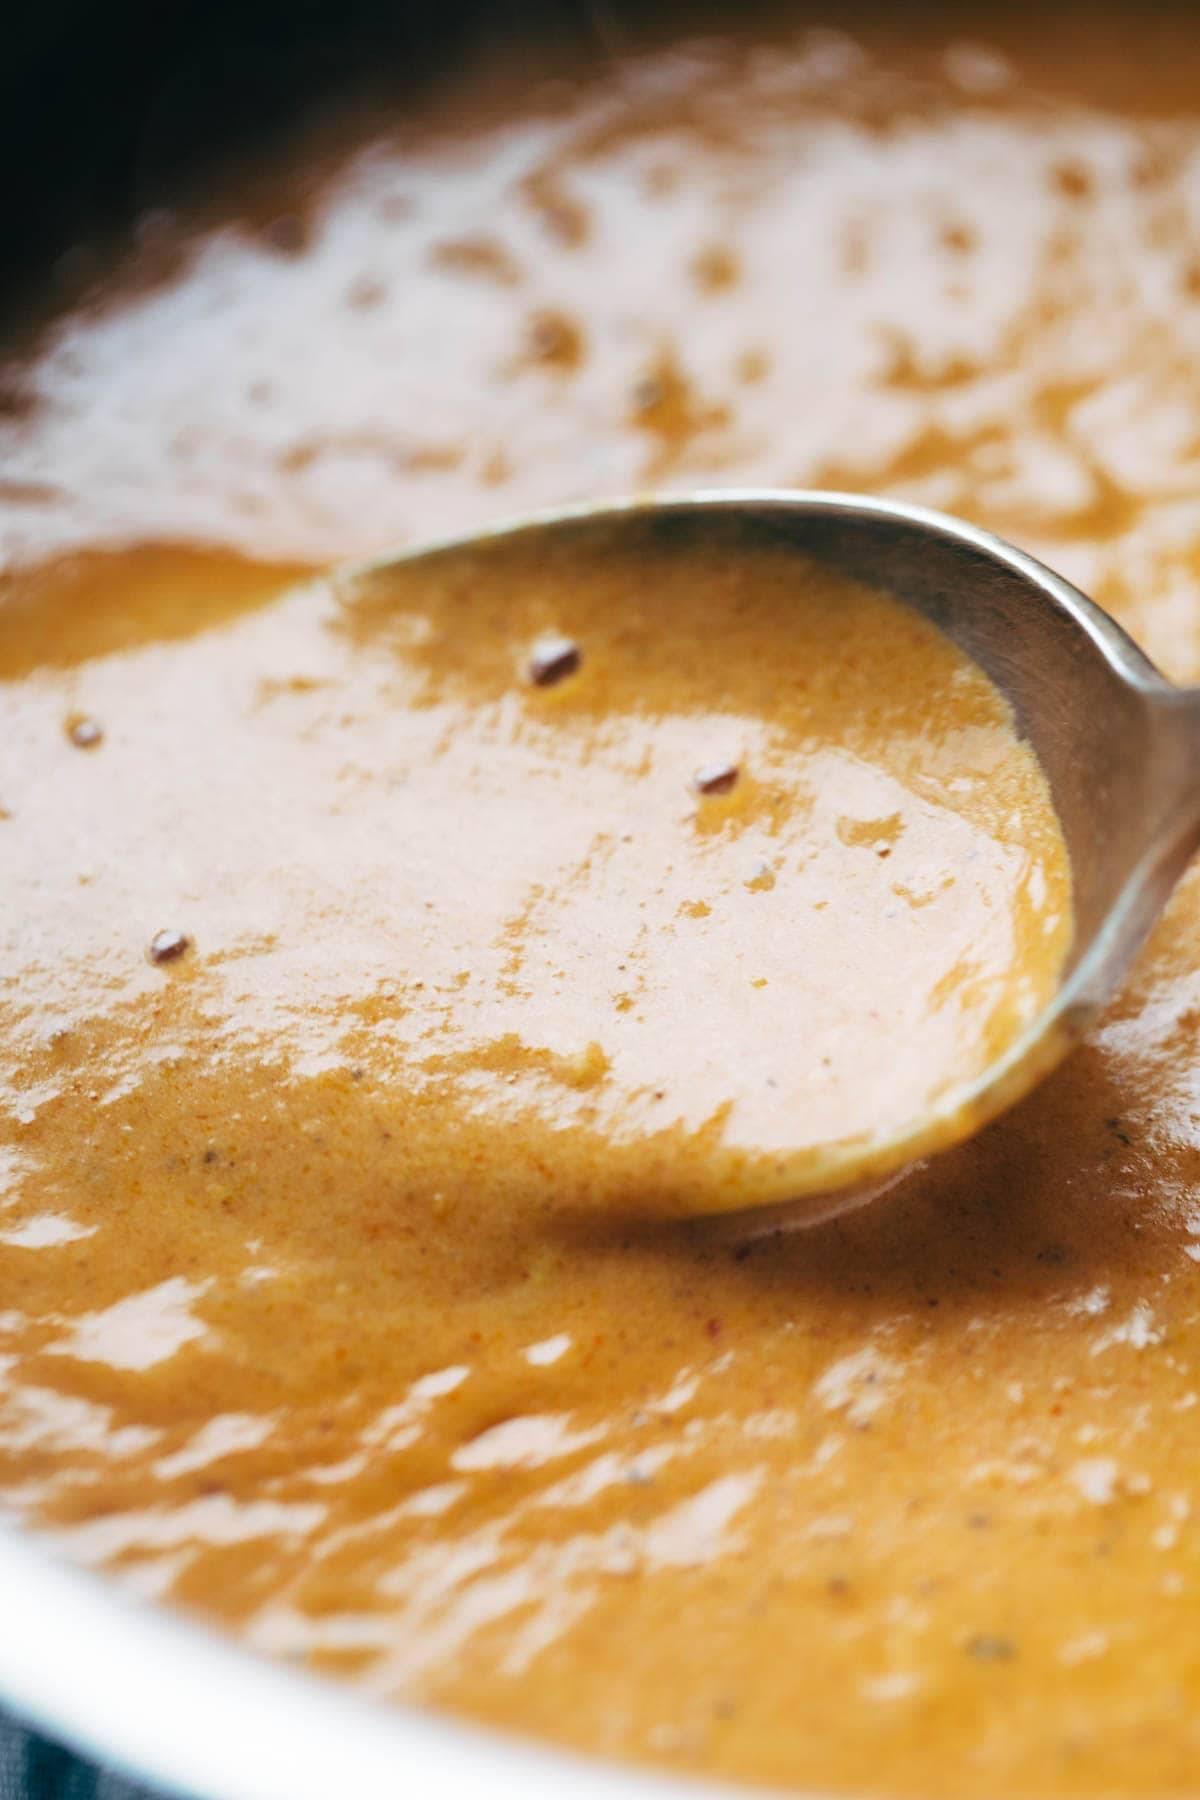 30 Minute Masala Sauce! made with onions, garlic, turmeric, cumin, chili powder, lemon juice, cilantro, tomato puree, and coconut milk. Perfect sauce for veggie or chicken tikka masala! Vegetarian / Vegan.| pinchofyum.com